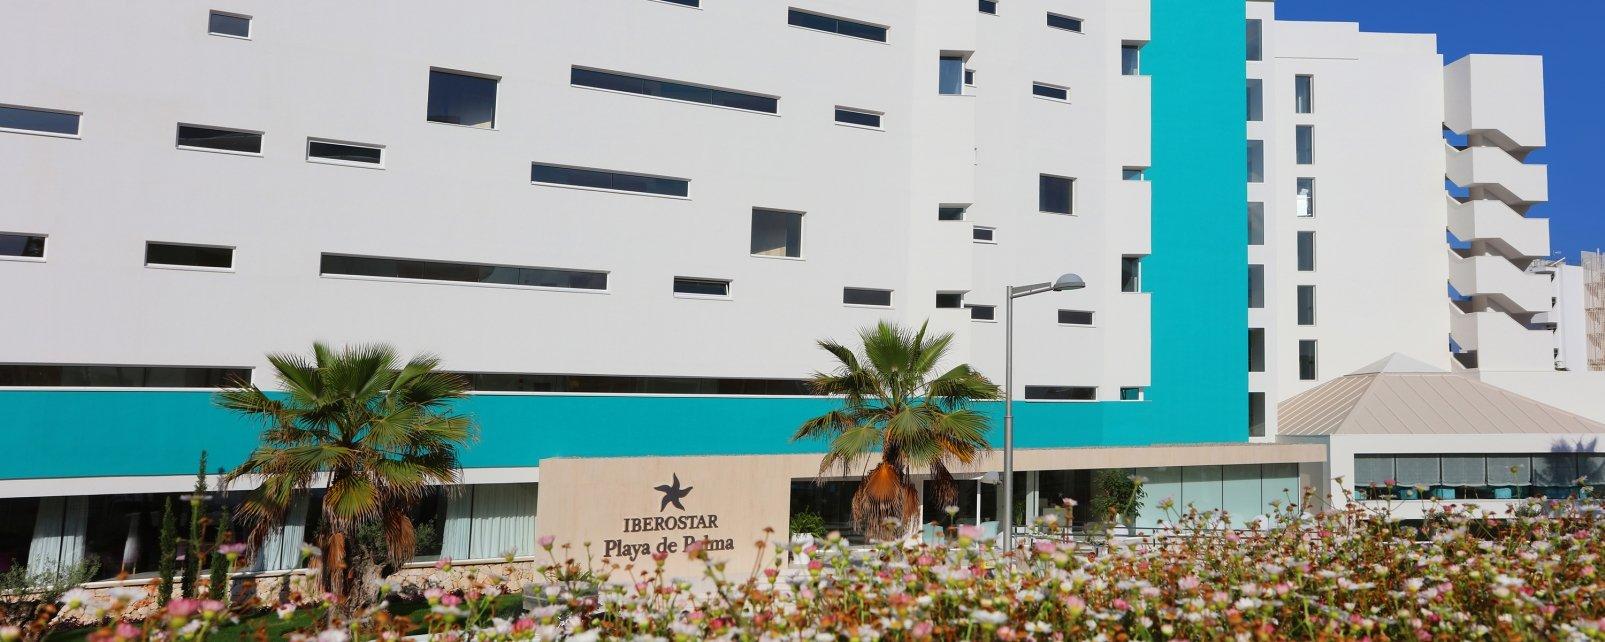 Hôtel Iberostar Playa de Palma